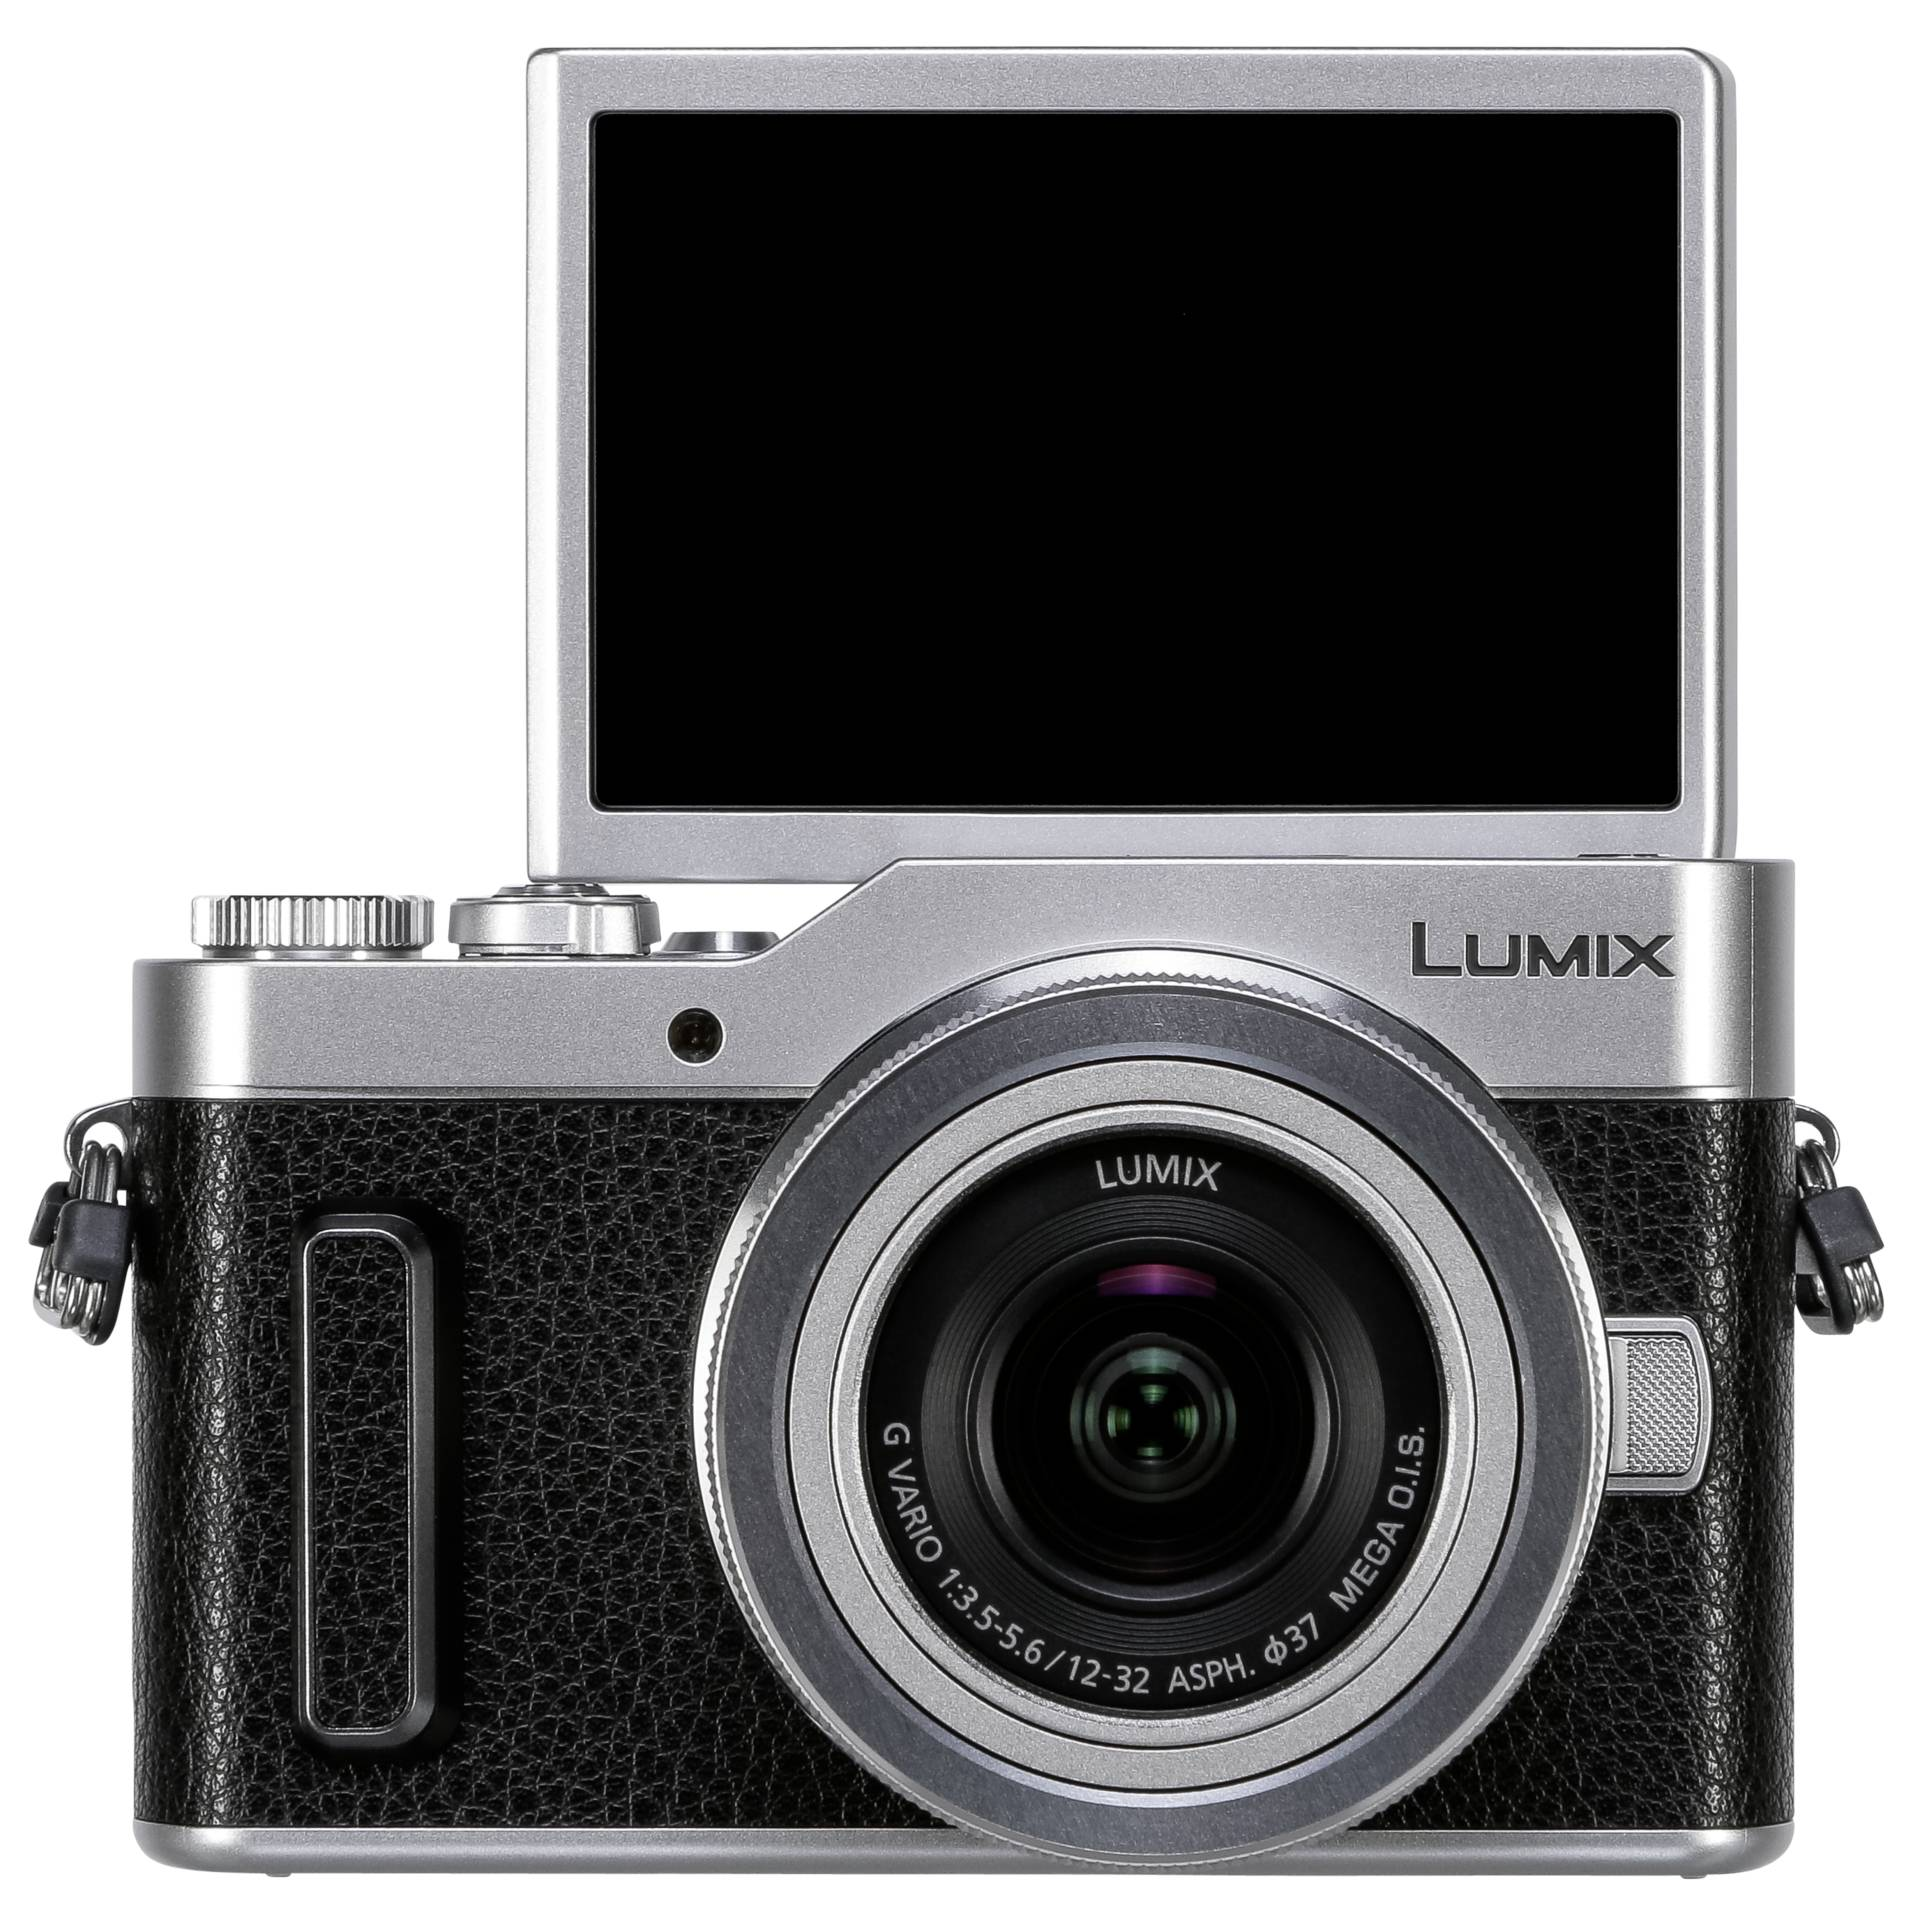 Panasonic Lumix DC-GX880 Kit schwarz/silber + H-FS 12-32 mm